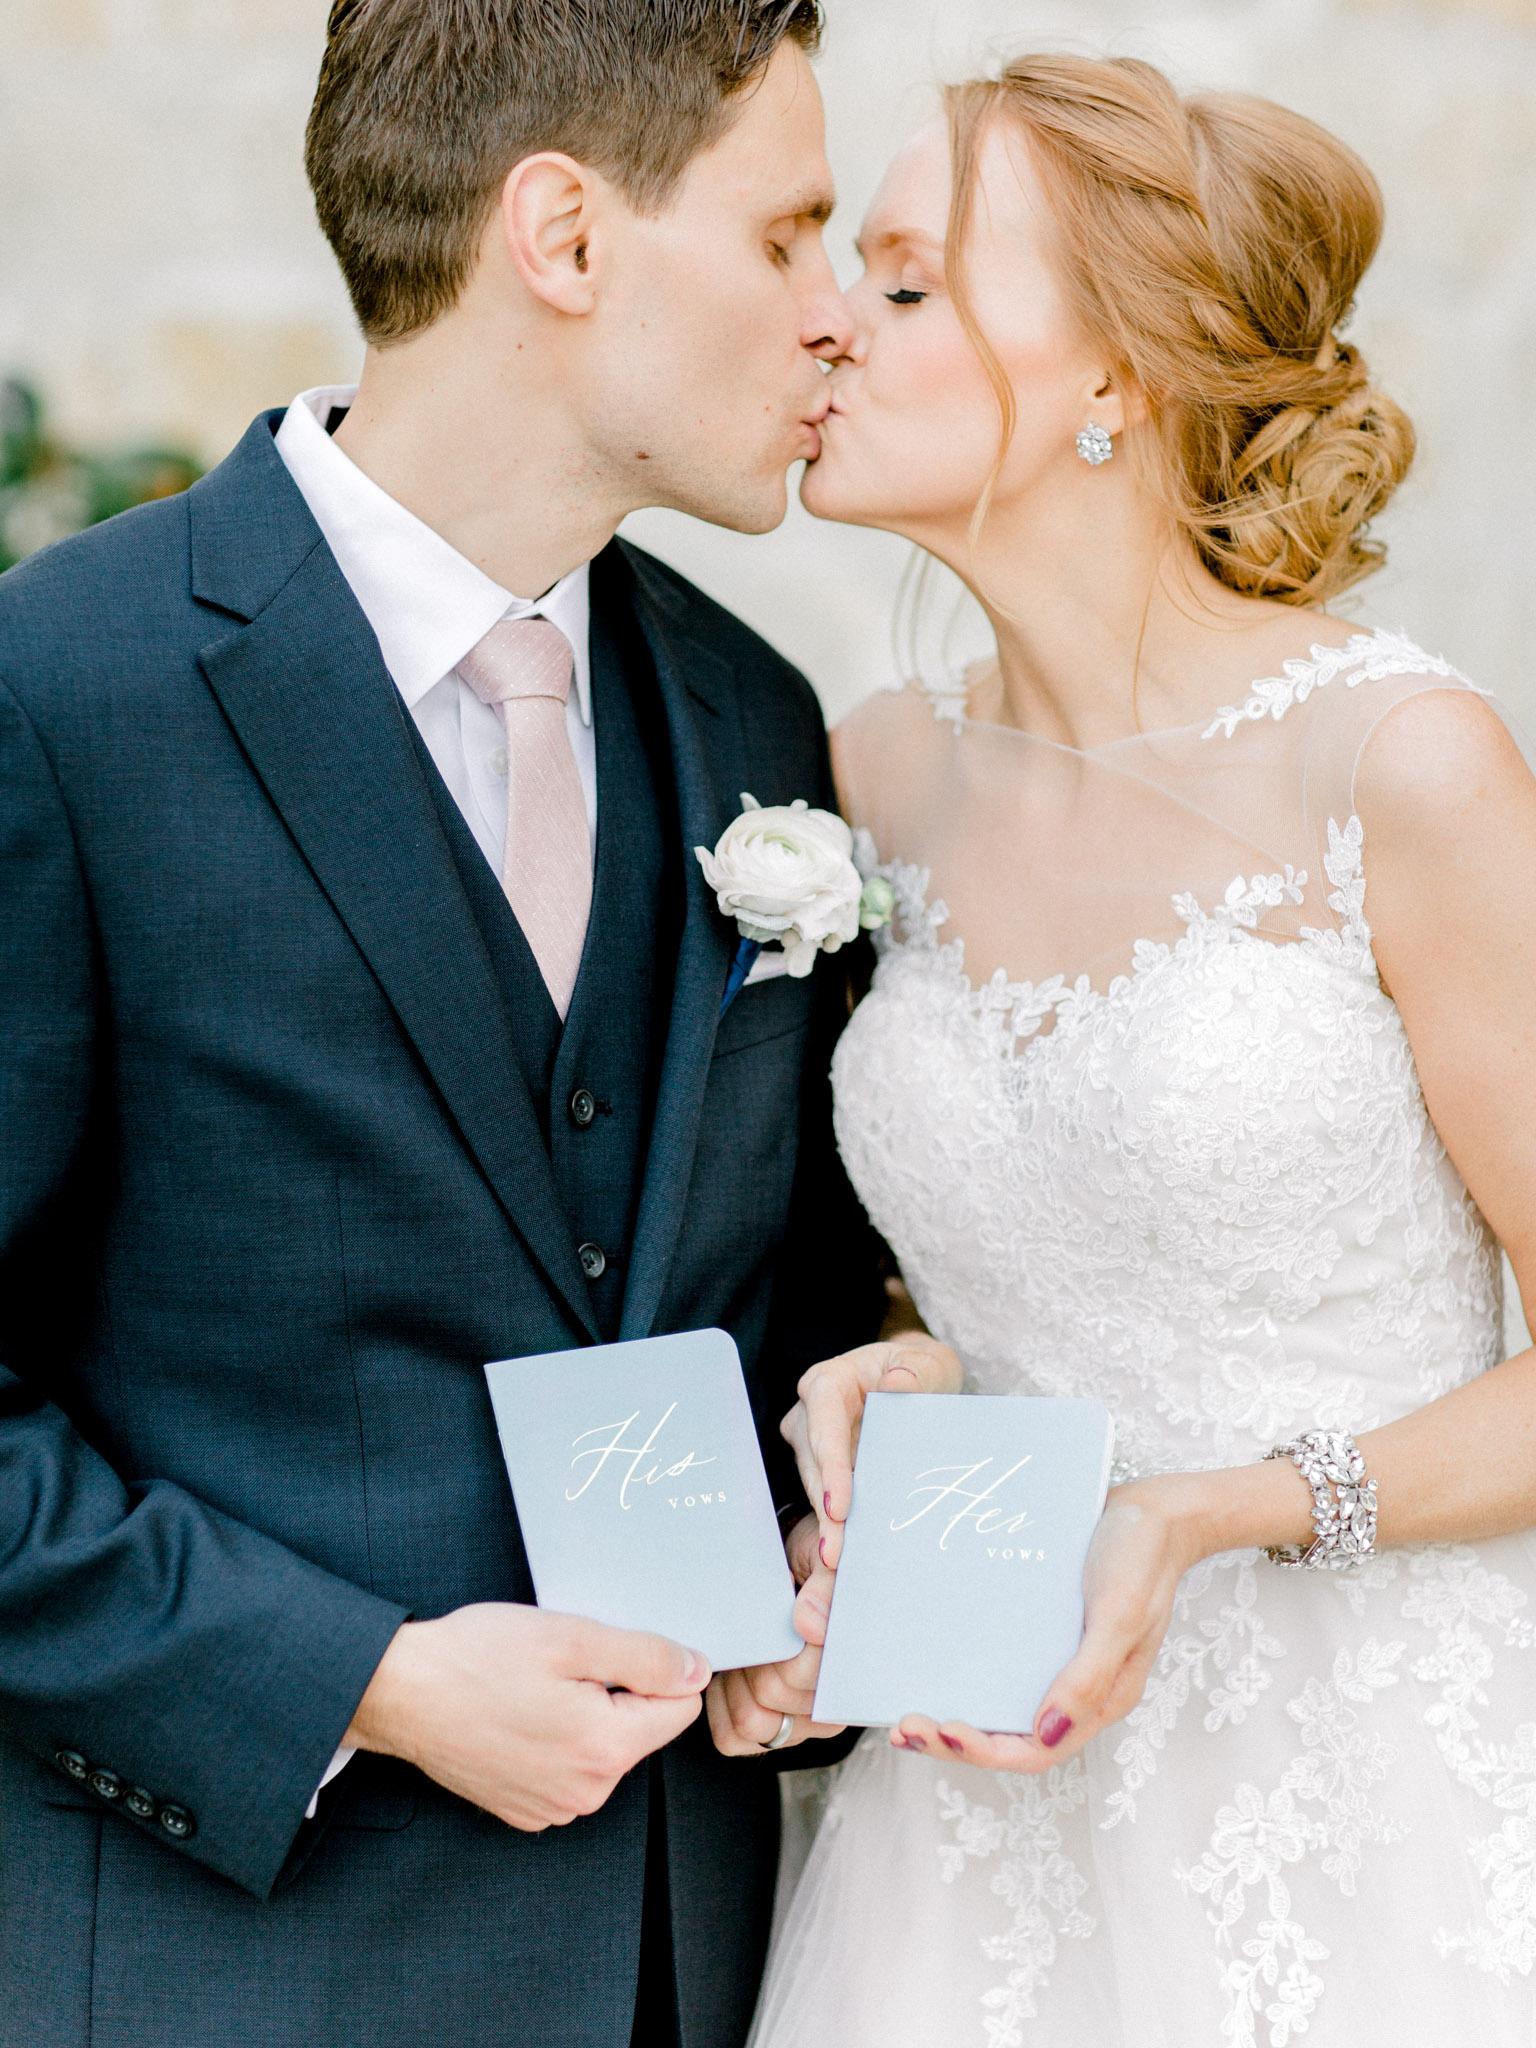 Christ Chapel Bible Church Wedding Photos - Natural Light Photography